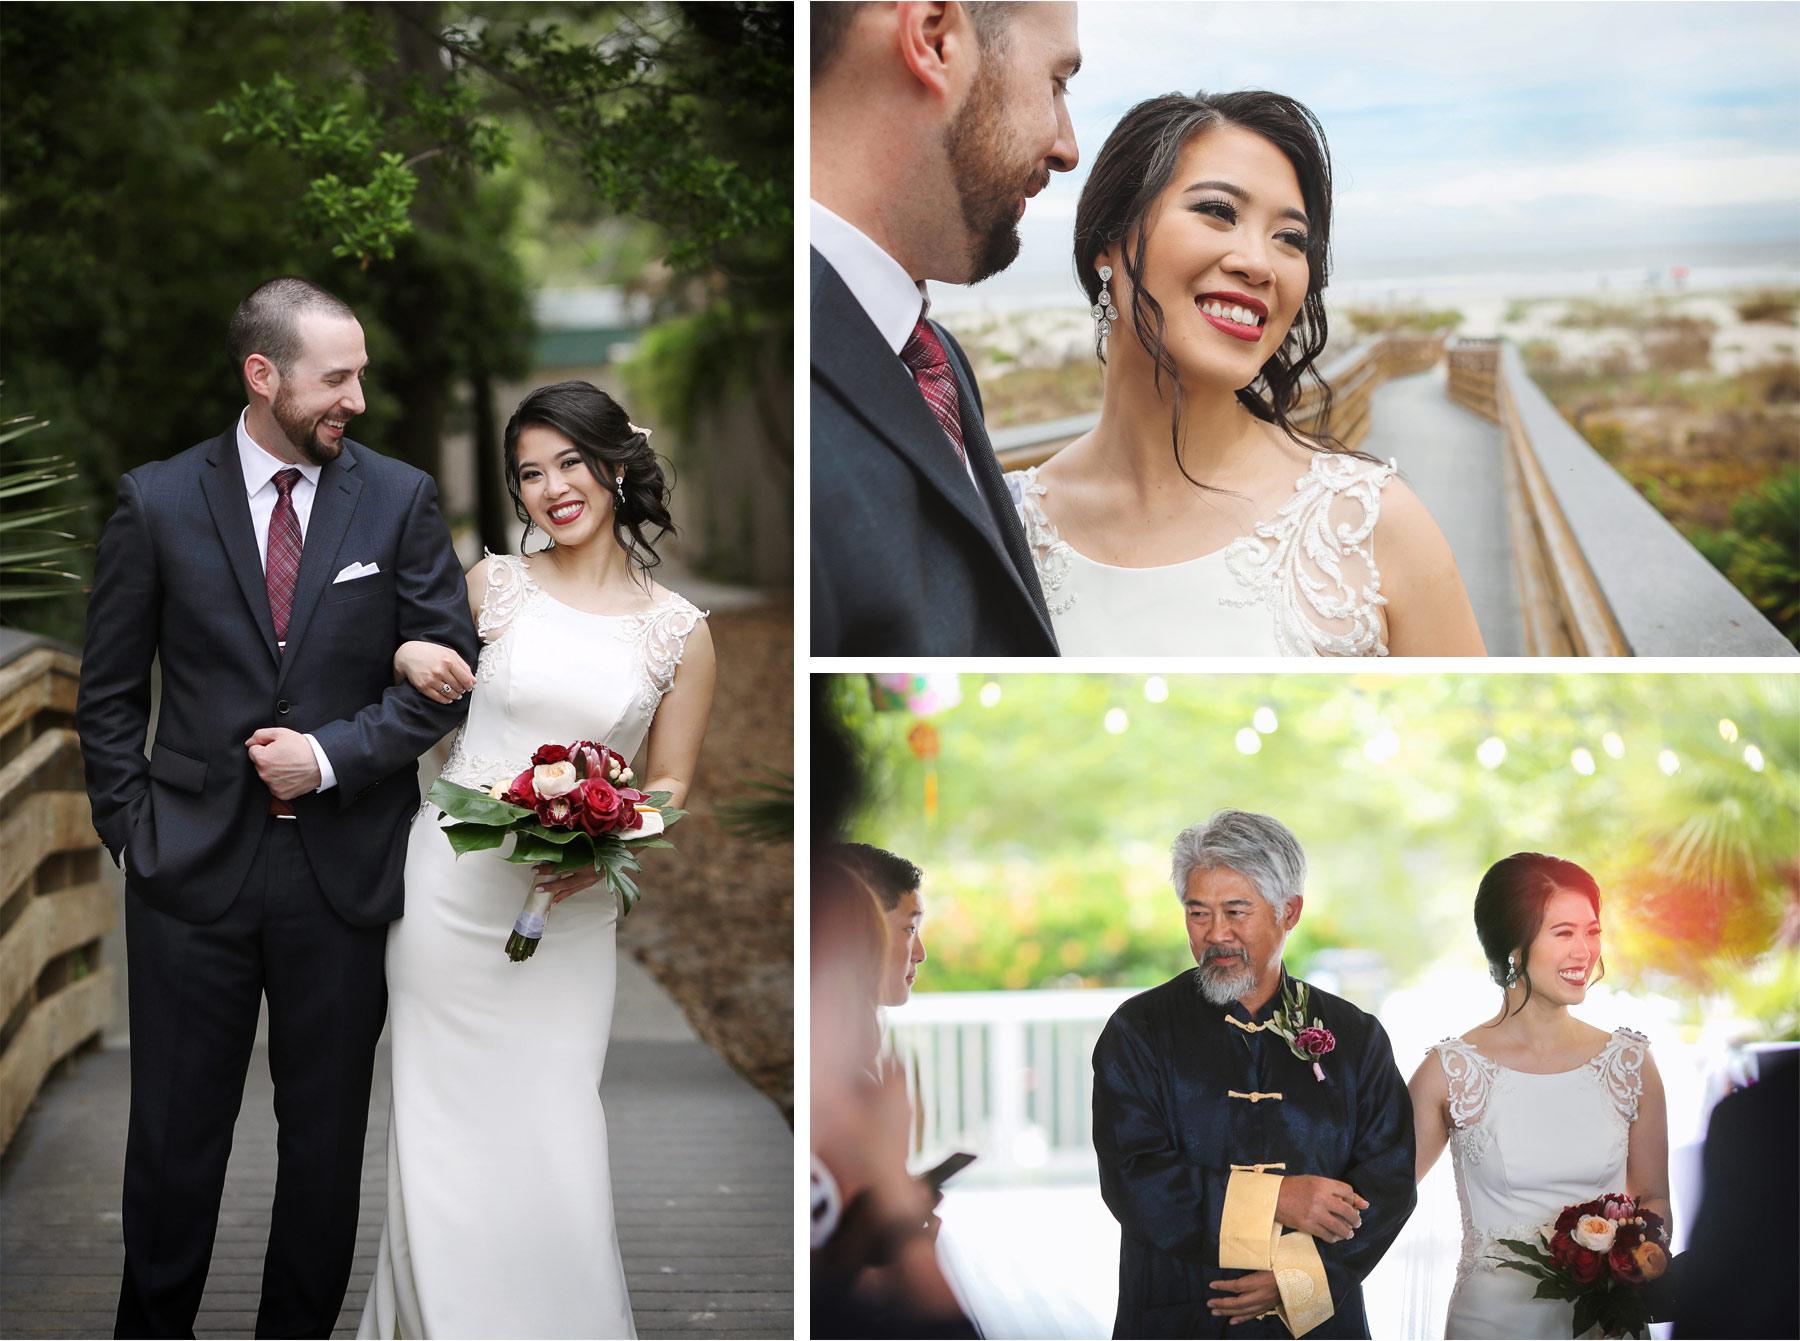 13-South-Carolina-Wedding-by-Vick-Photography-Hilton-Head-Island-Omni-Oceanfront-Hotel-Destination-Boardwalk-Ceremony-Tropical-Felyn-and-Will.jpg